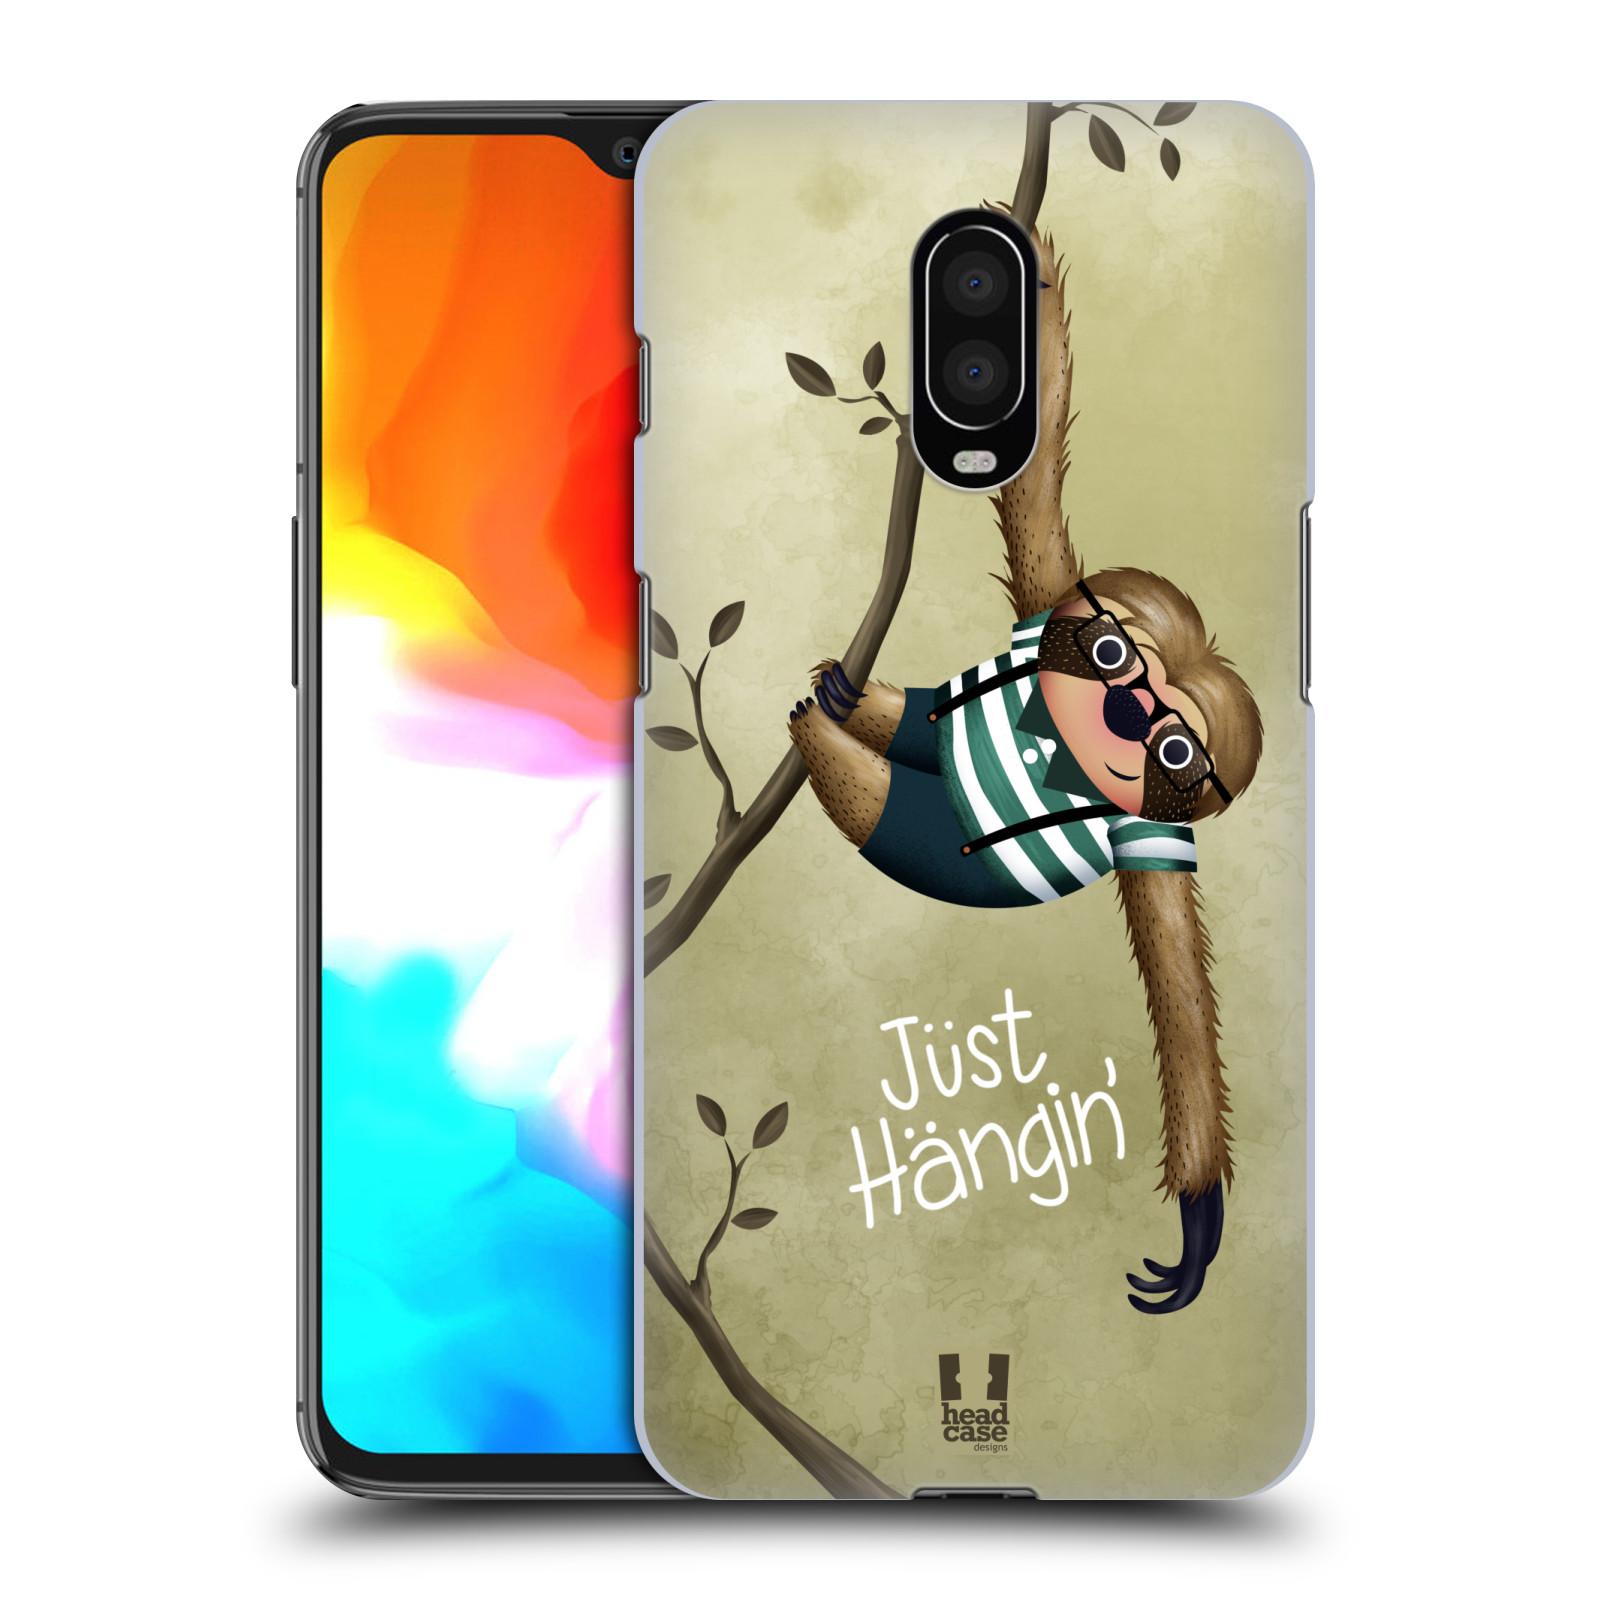 Plastové pouzdro na mobil OnePlus 6T - Head Case - Lenochod Just Hangin